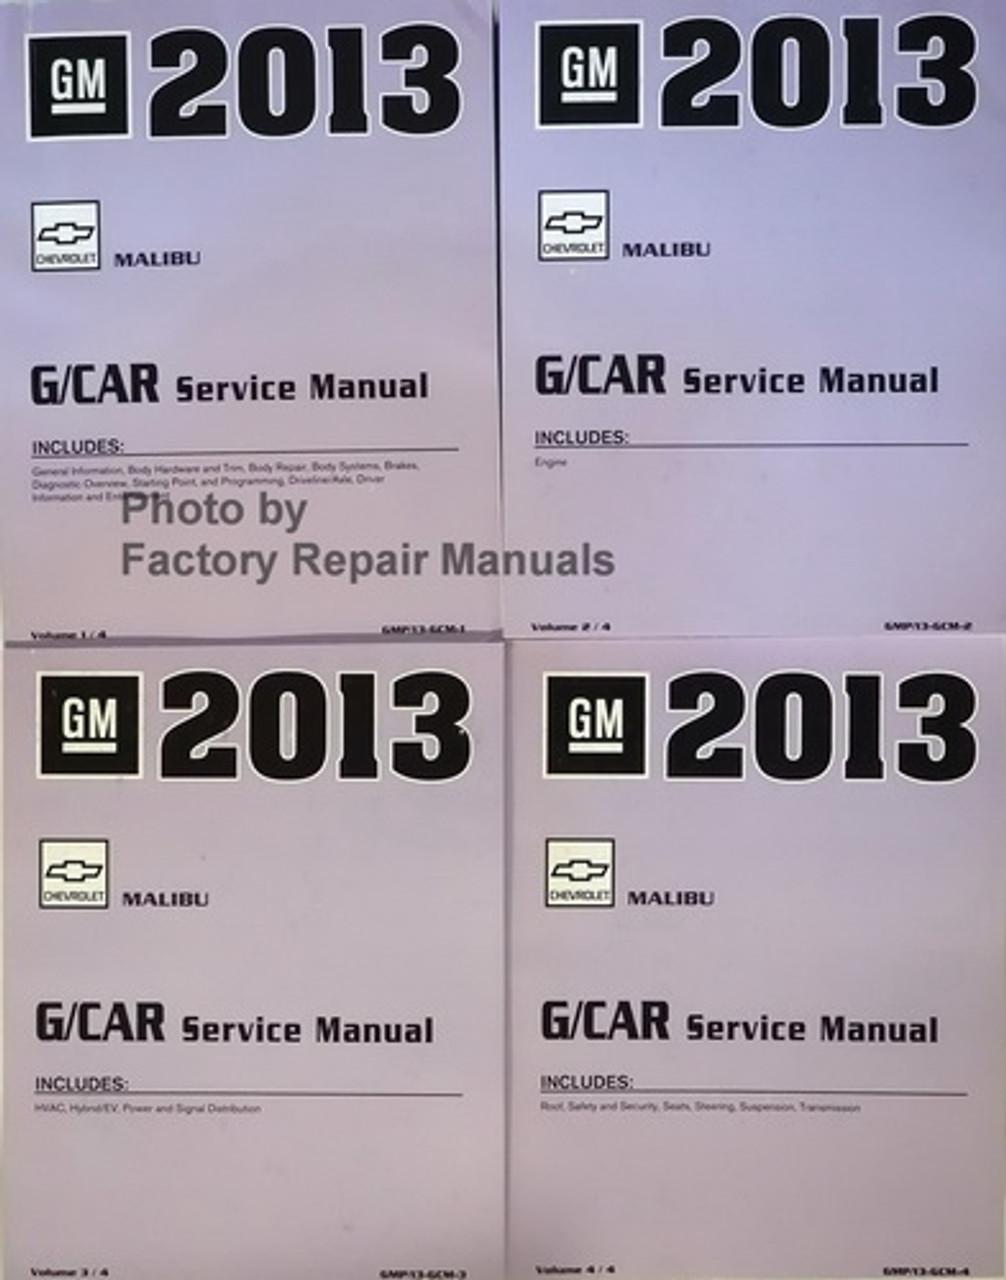 2013 Chevy Malibu Factory Service Manual Set Original Shop Repair